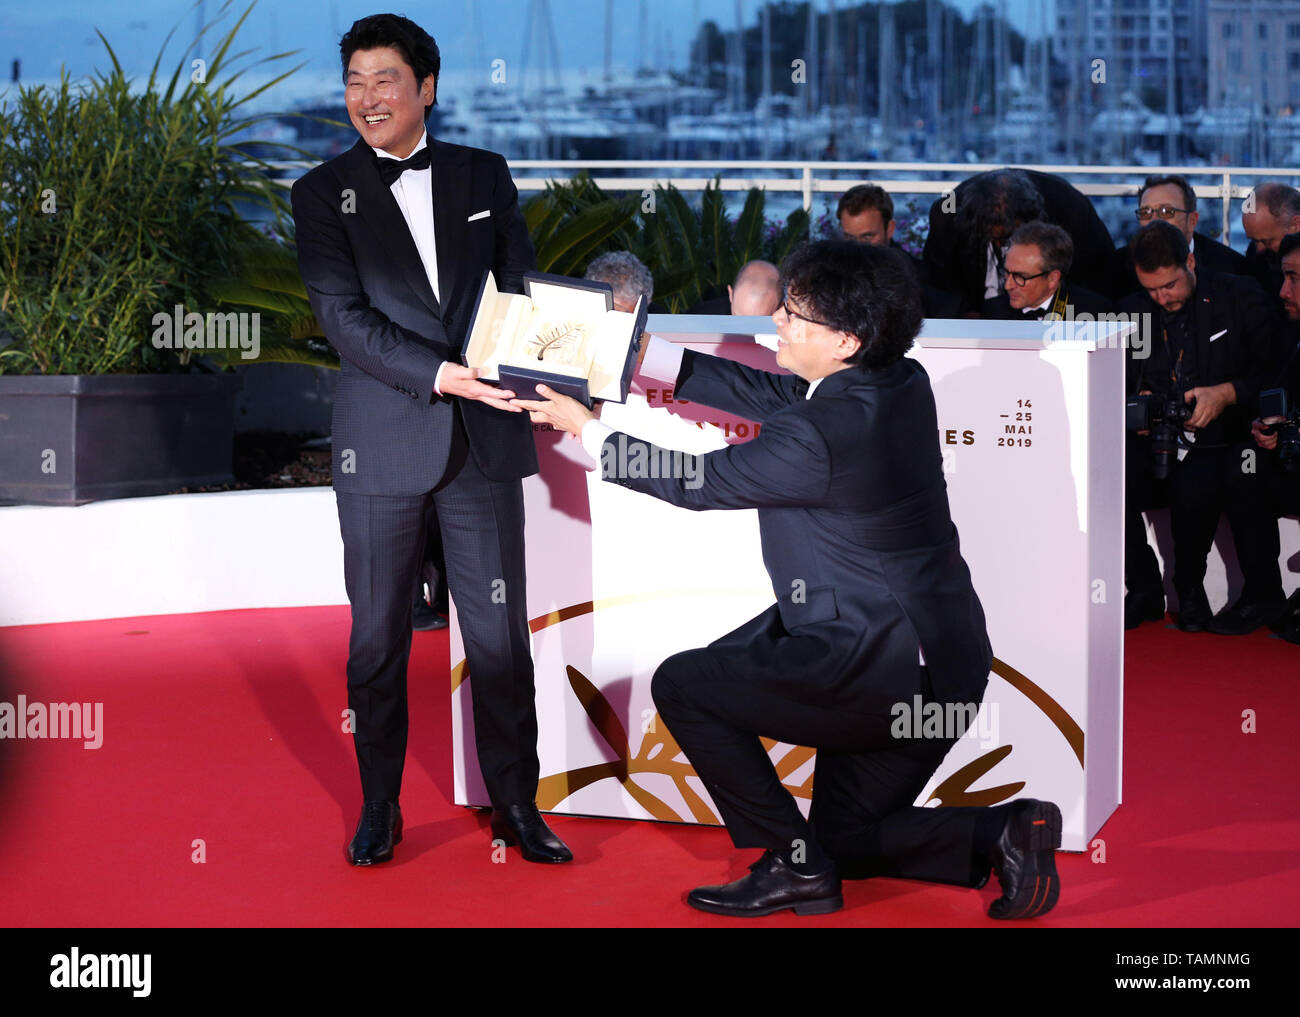 Cannes, France  25th May, 2019  South Korean director Bong Joon-Ho